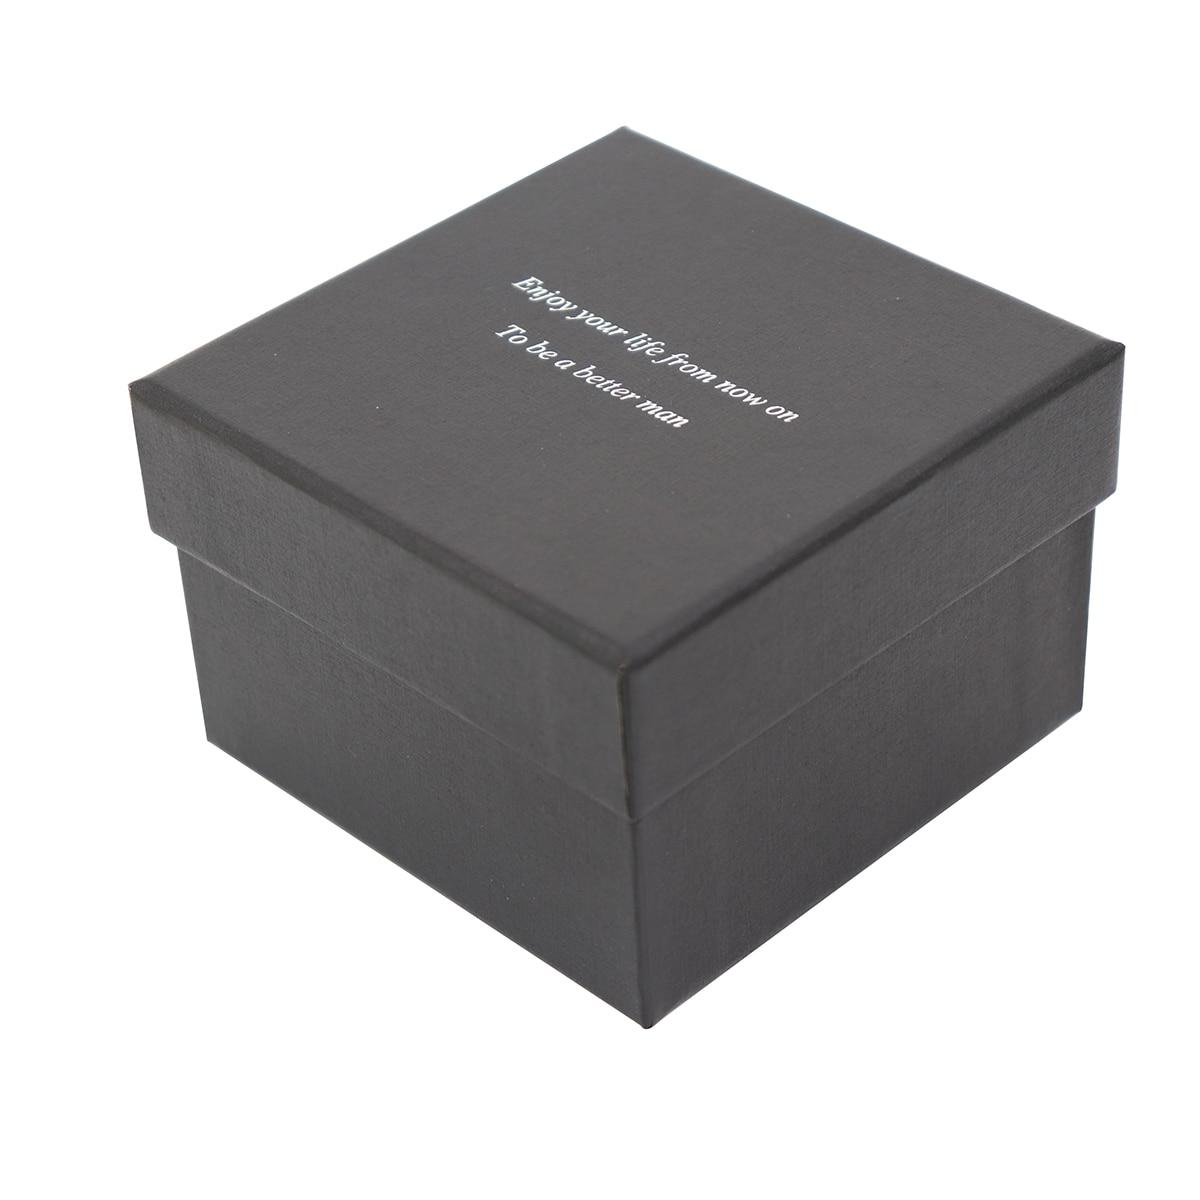 2020 Brand Ne Business Work Necktie High Quality Geometric Plaid 7CM Tie For Men Fashion Formal  Gentleman Cravate Gift Box